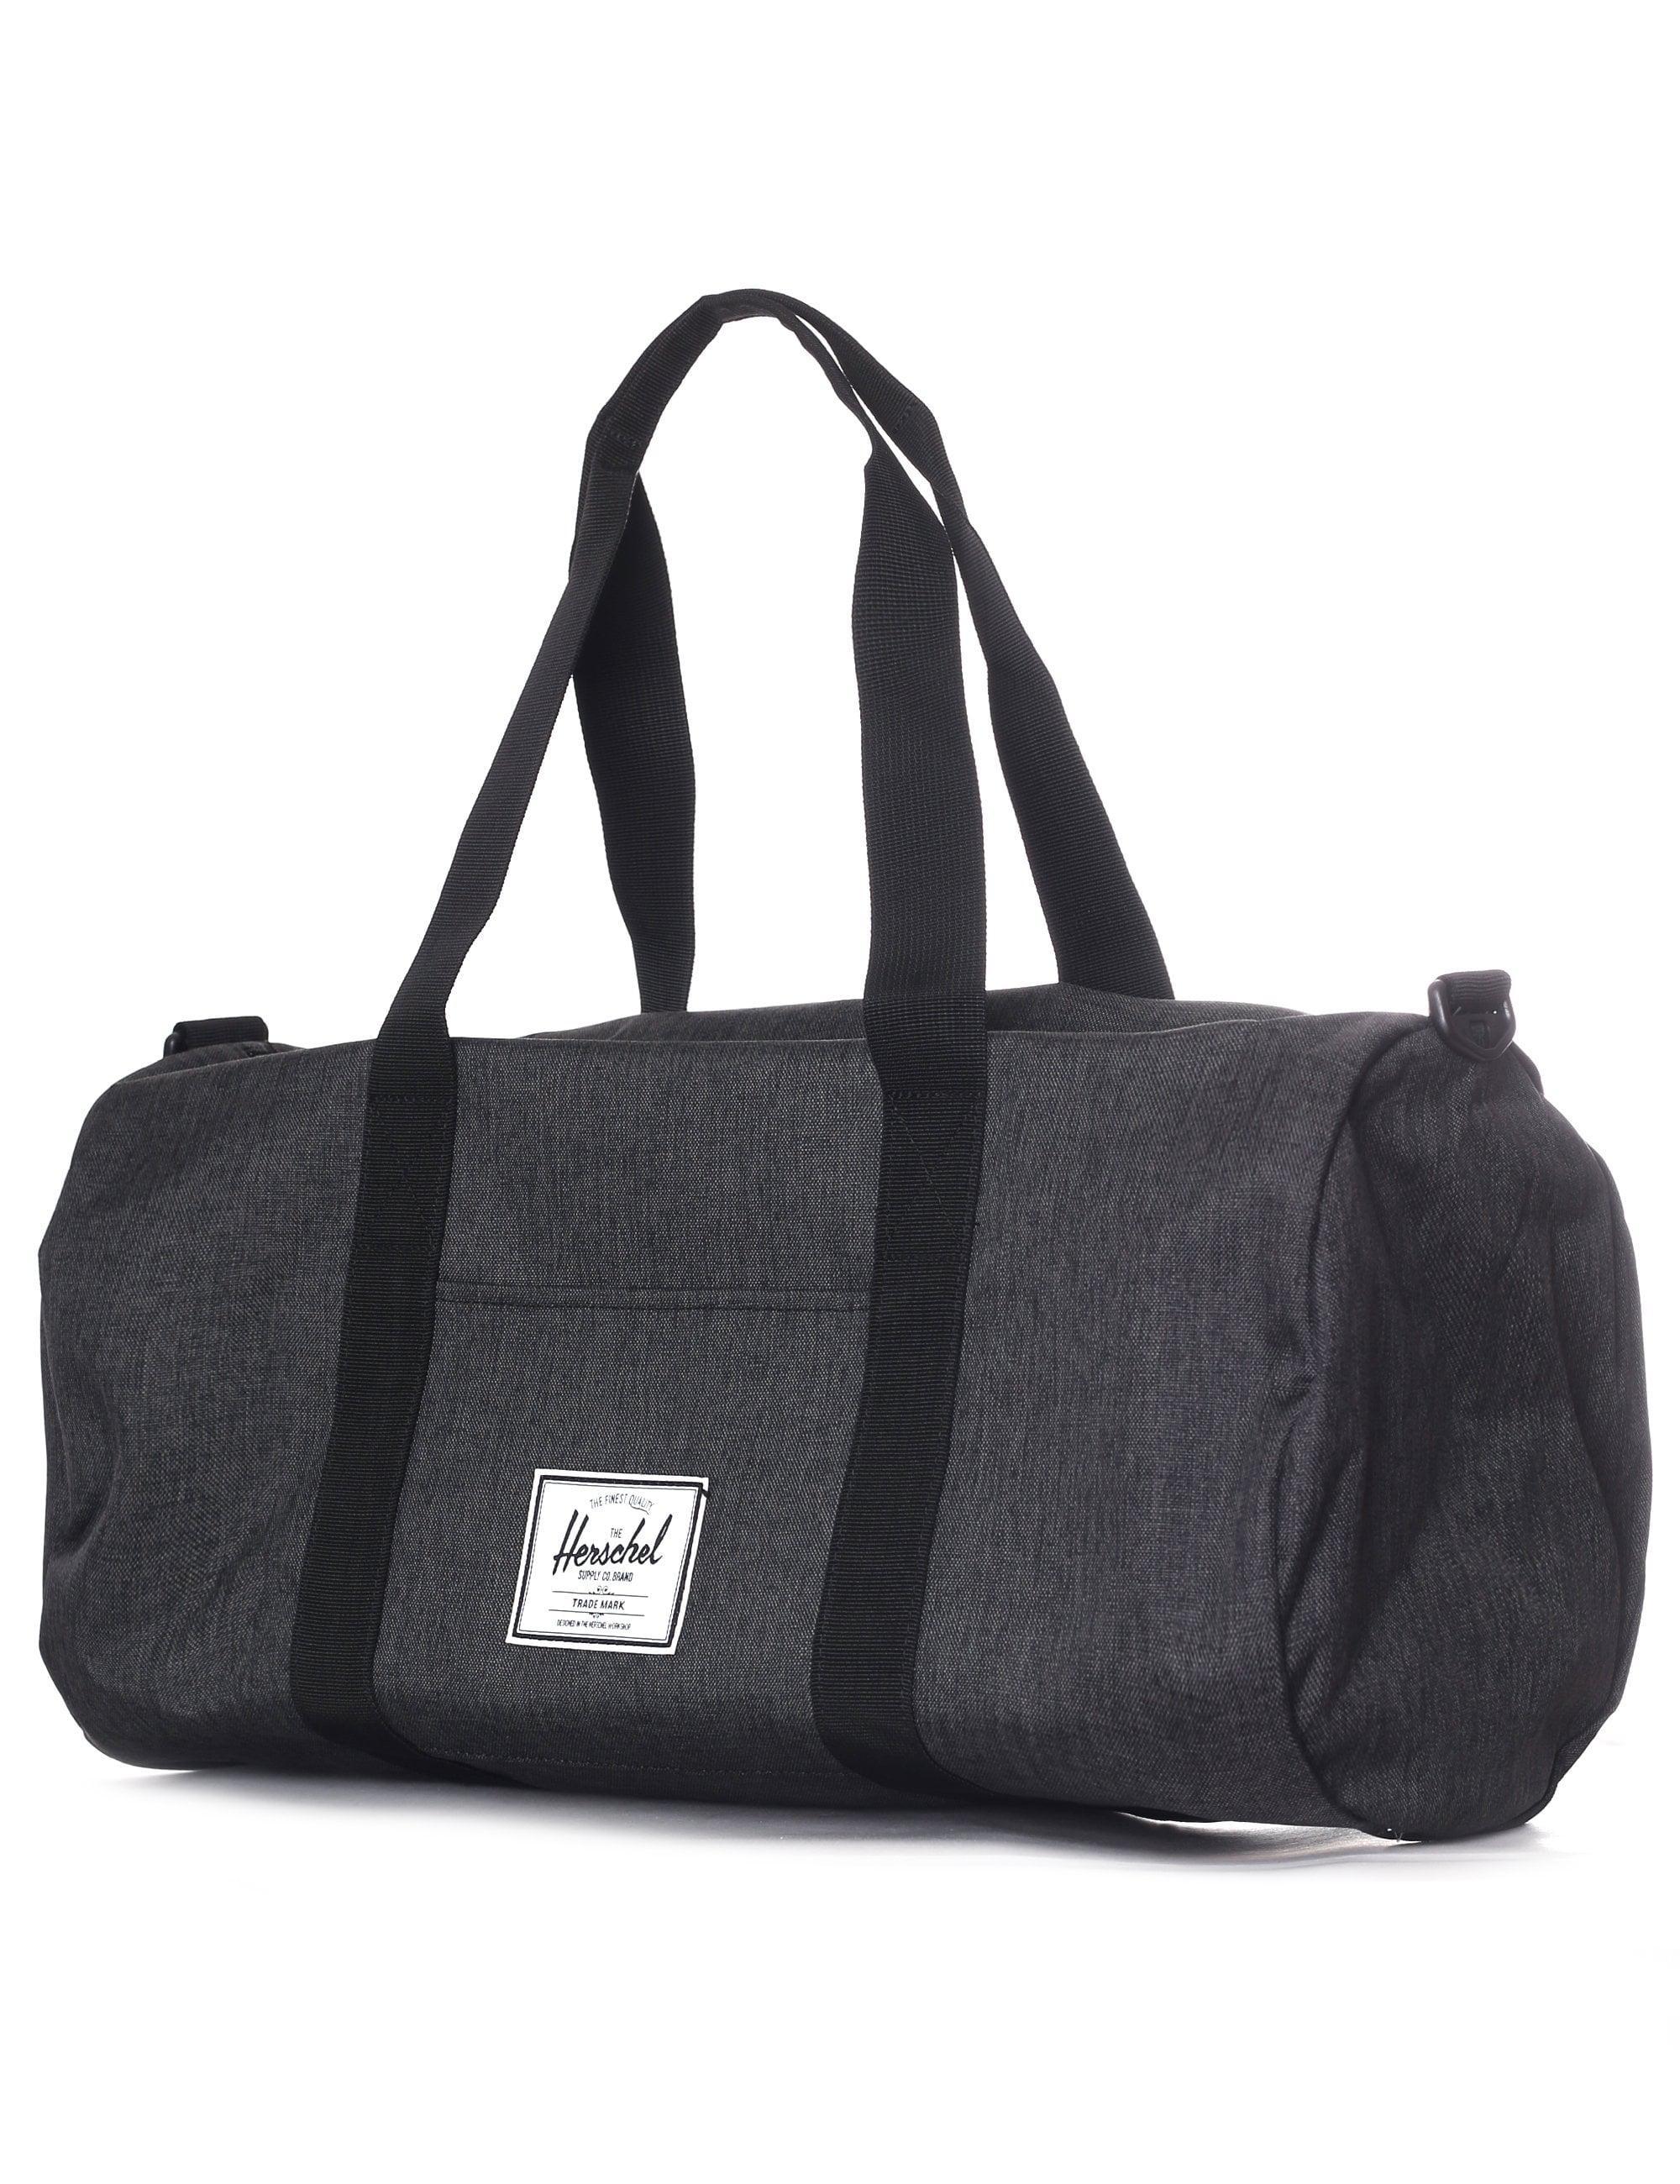 984a89fc82ba Herschel Supply Co. Sutton Duffle Bag Mid Volume Black Crosshatch black in  Black for Men - Lyst